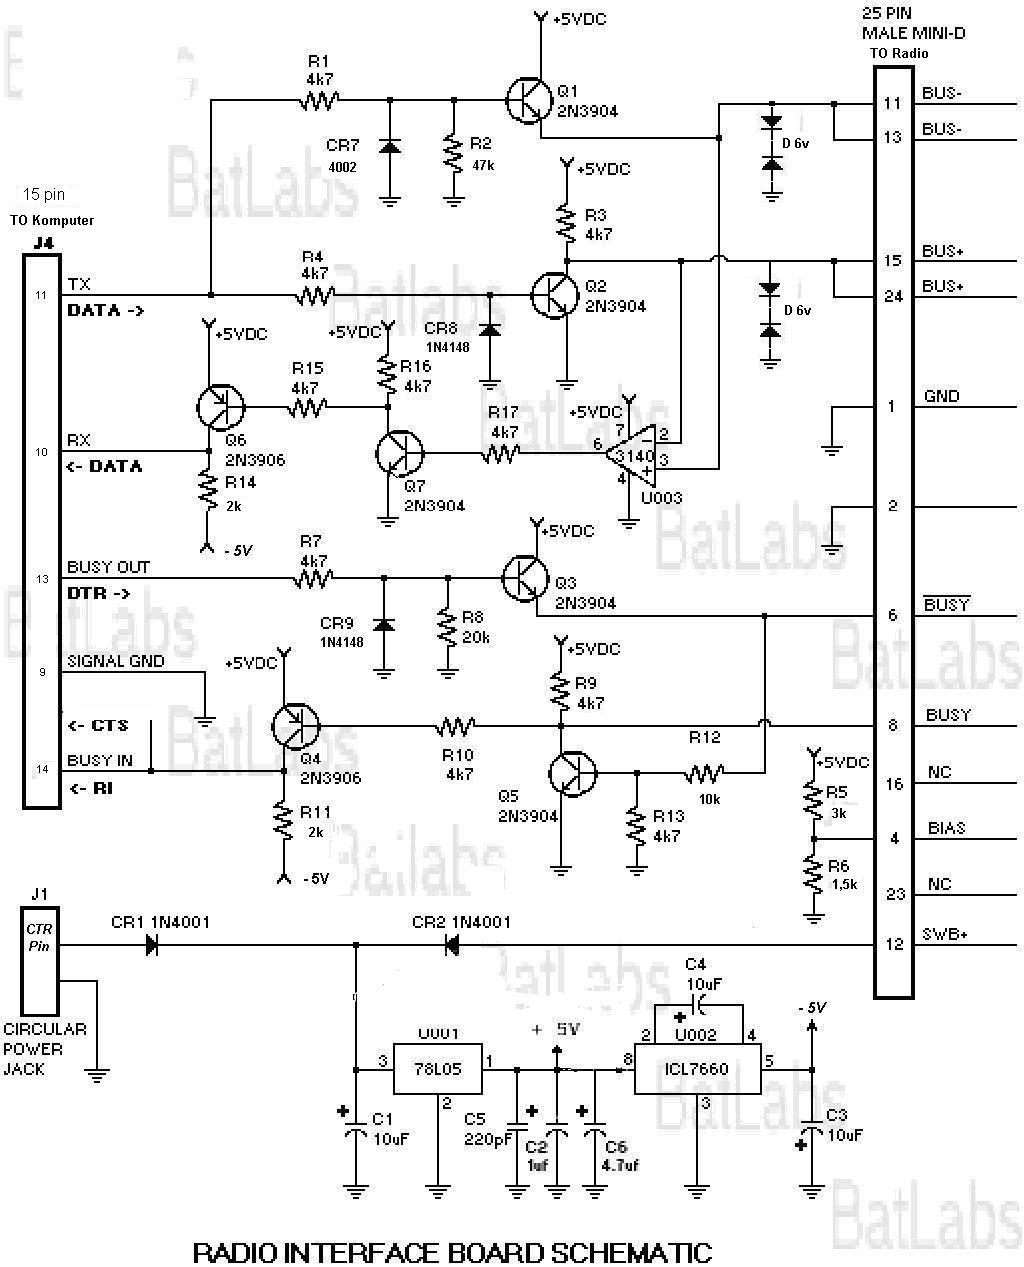 Solucionado: programar magone con programador original de